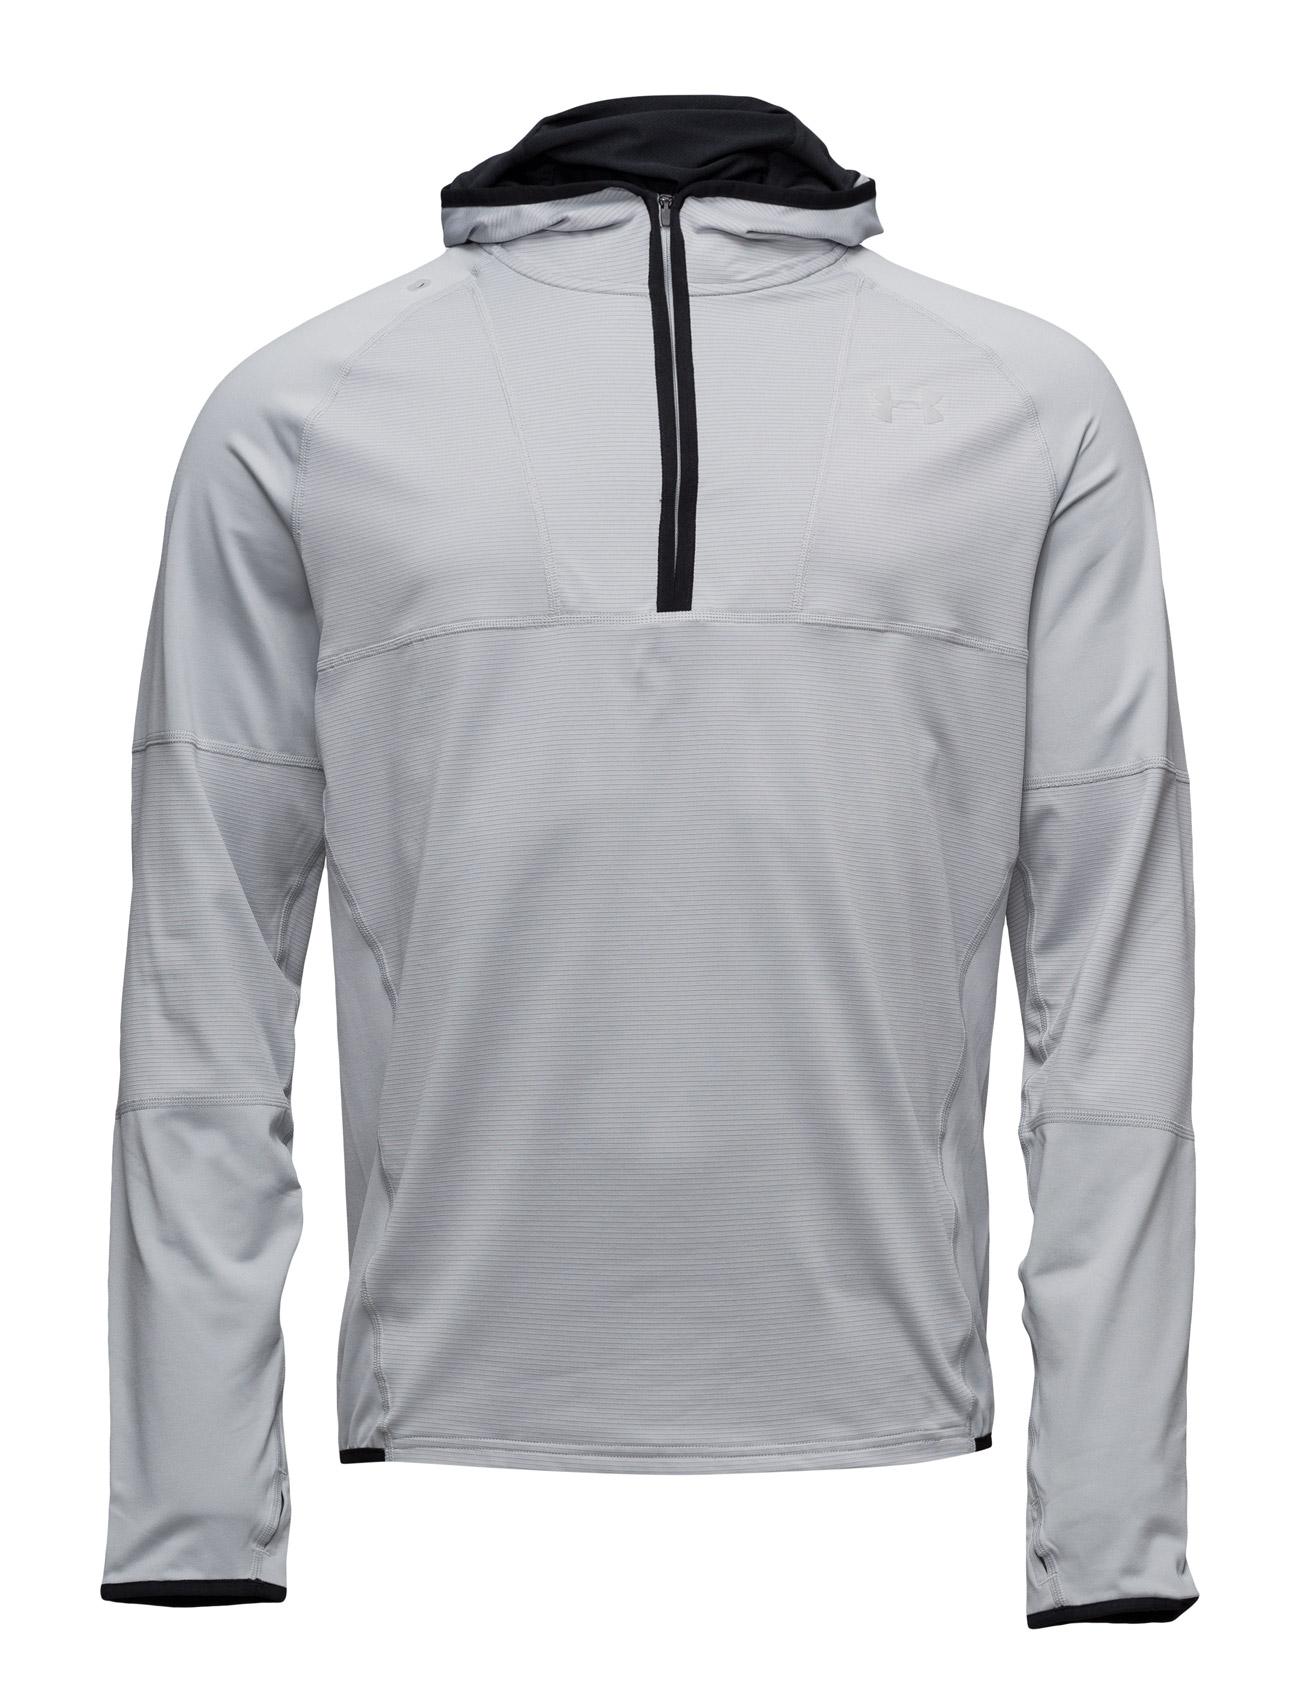 Threadborne Balaclava Under Armour Sports sweatshirts til Mænd i Sort